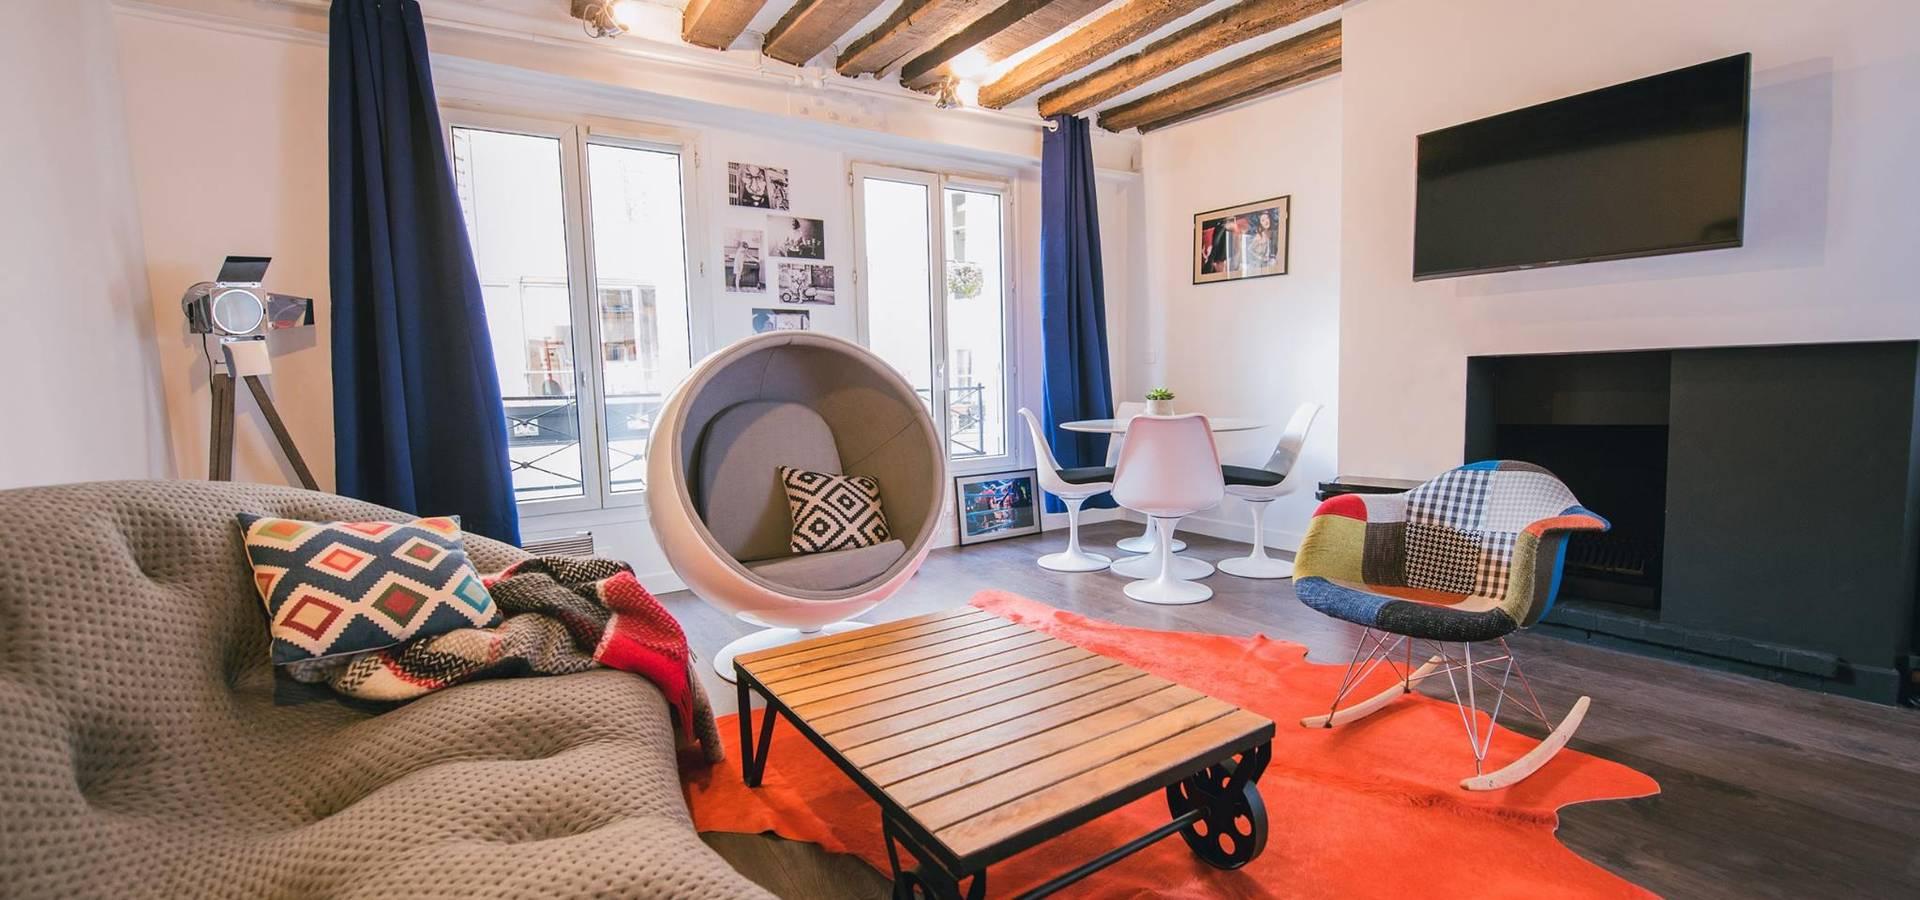 Kast Design تصميم داخلي في Paris هوميفاي